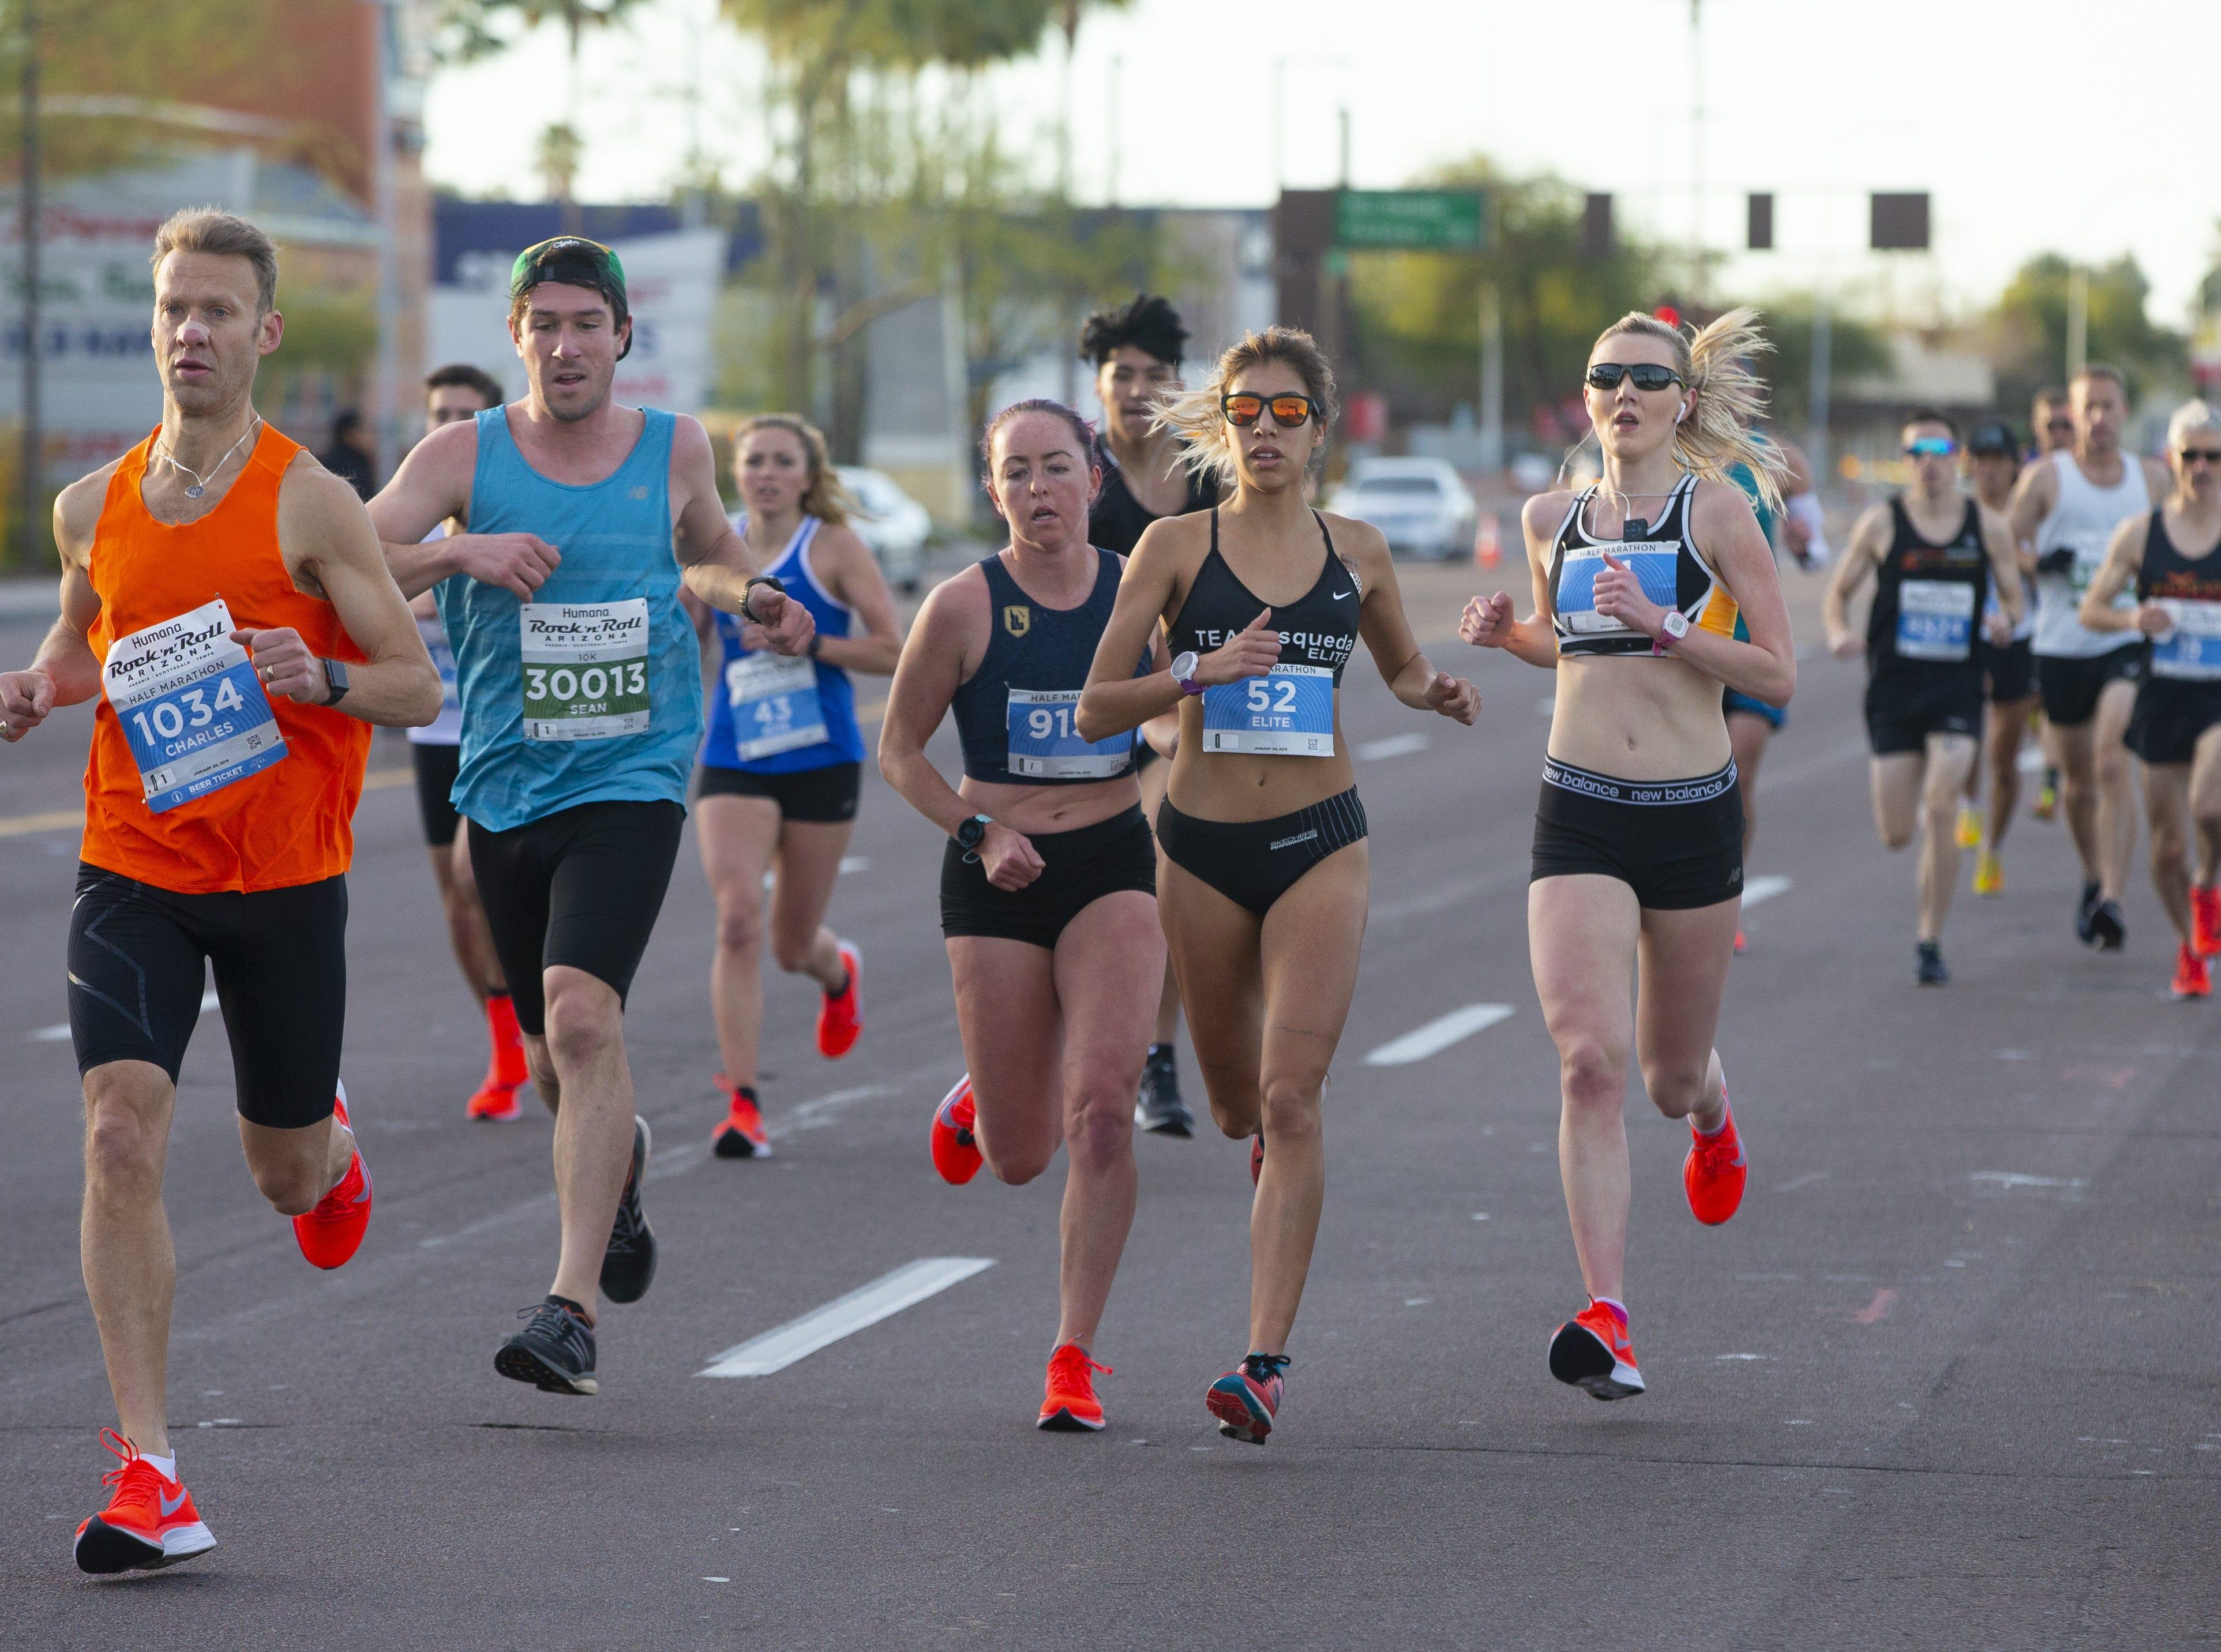 Runners compete in the Humana Rock 'N' Roll half-marathon on Jan. 20, 2019.